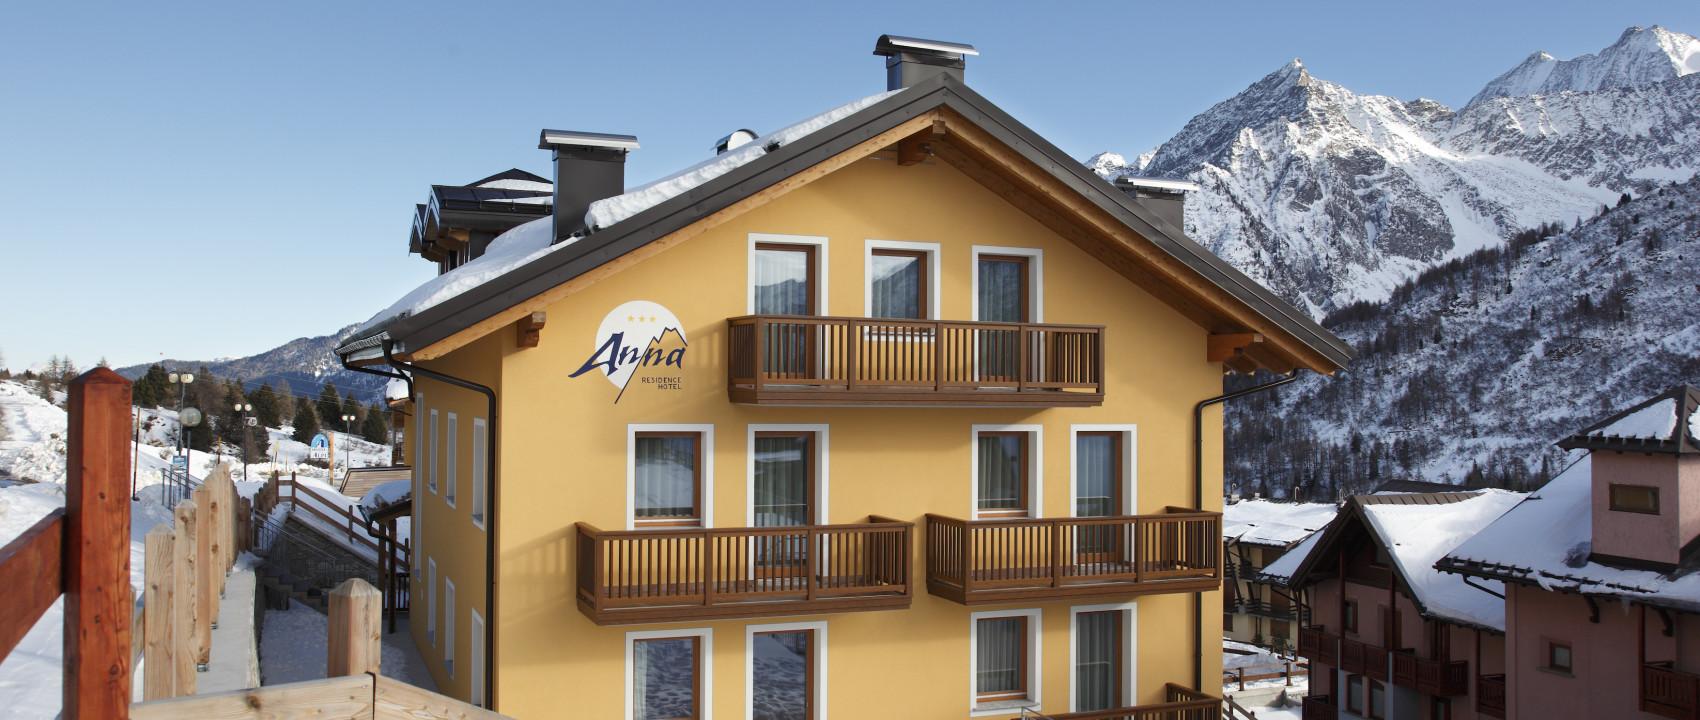 Residence Hotel Anna Tonale